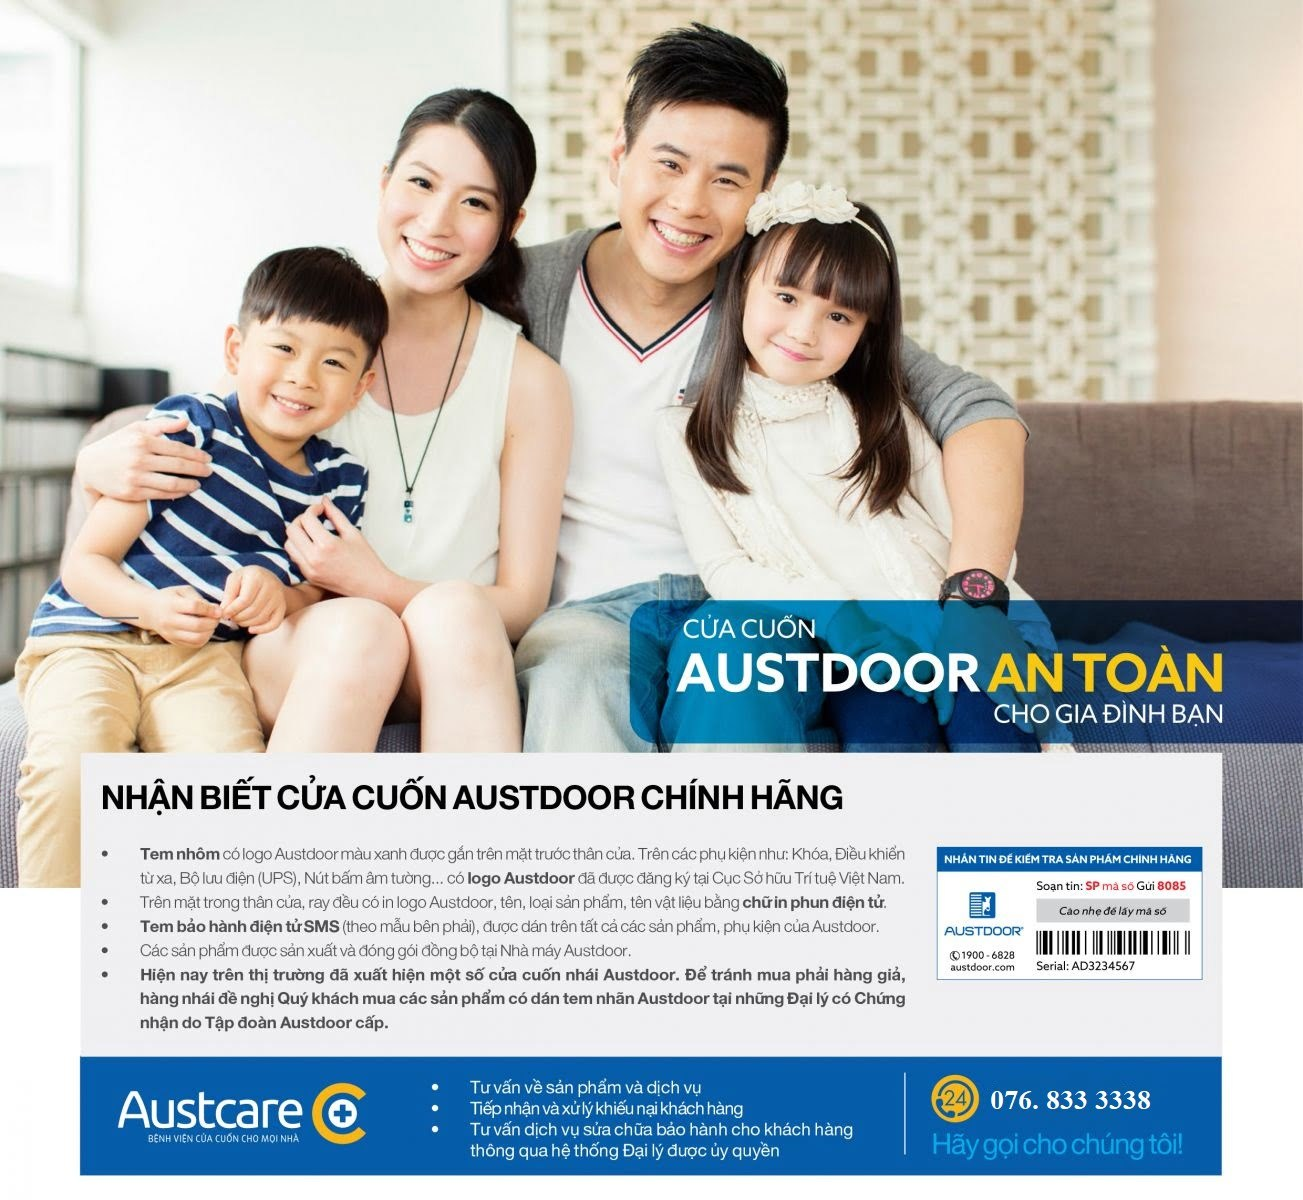 nhan-biet-san-pham-chinh-hang-cua-cuon-austdoor